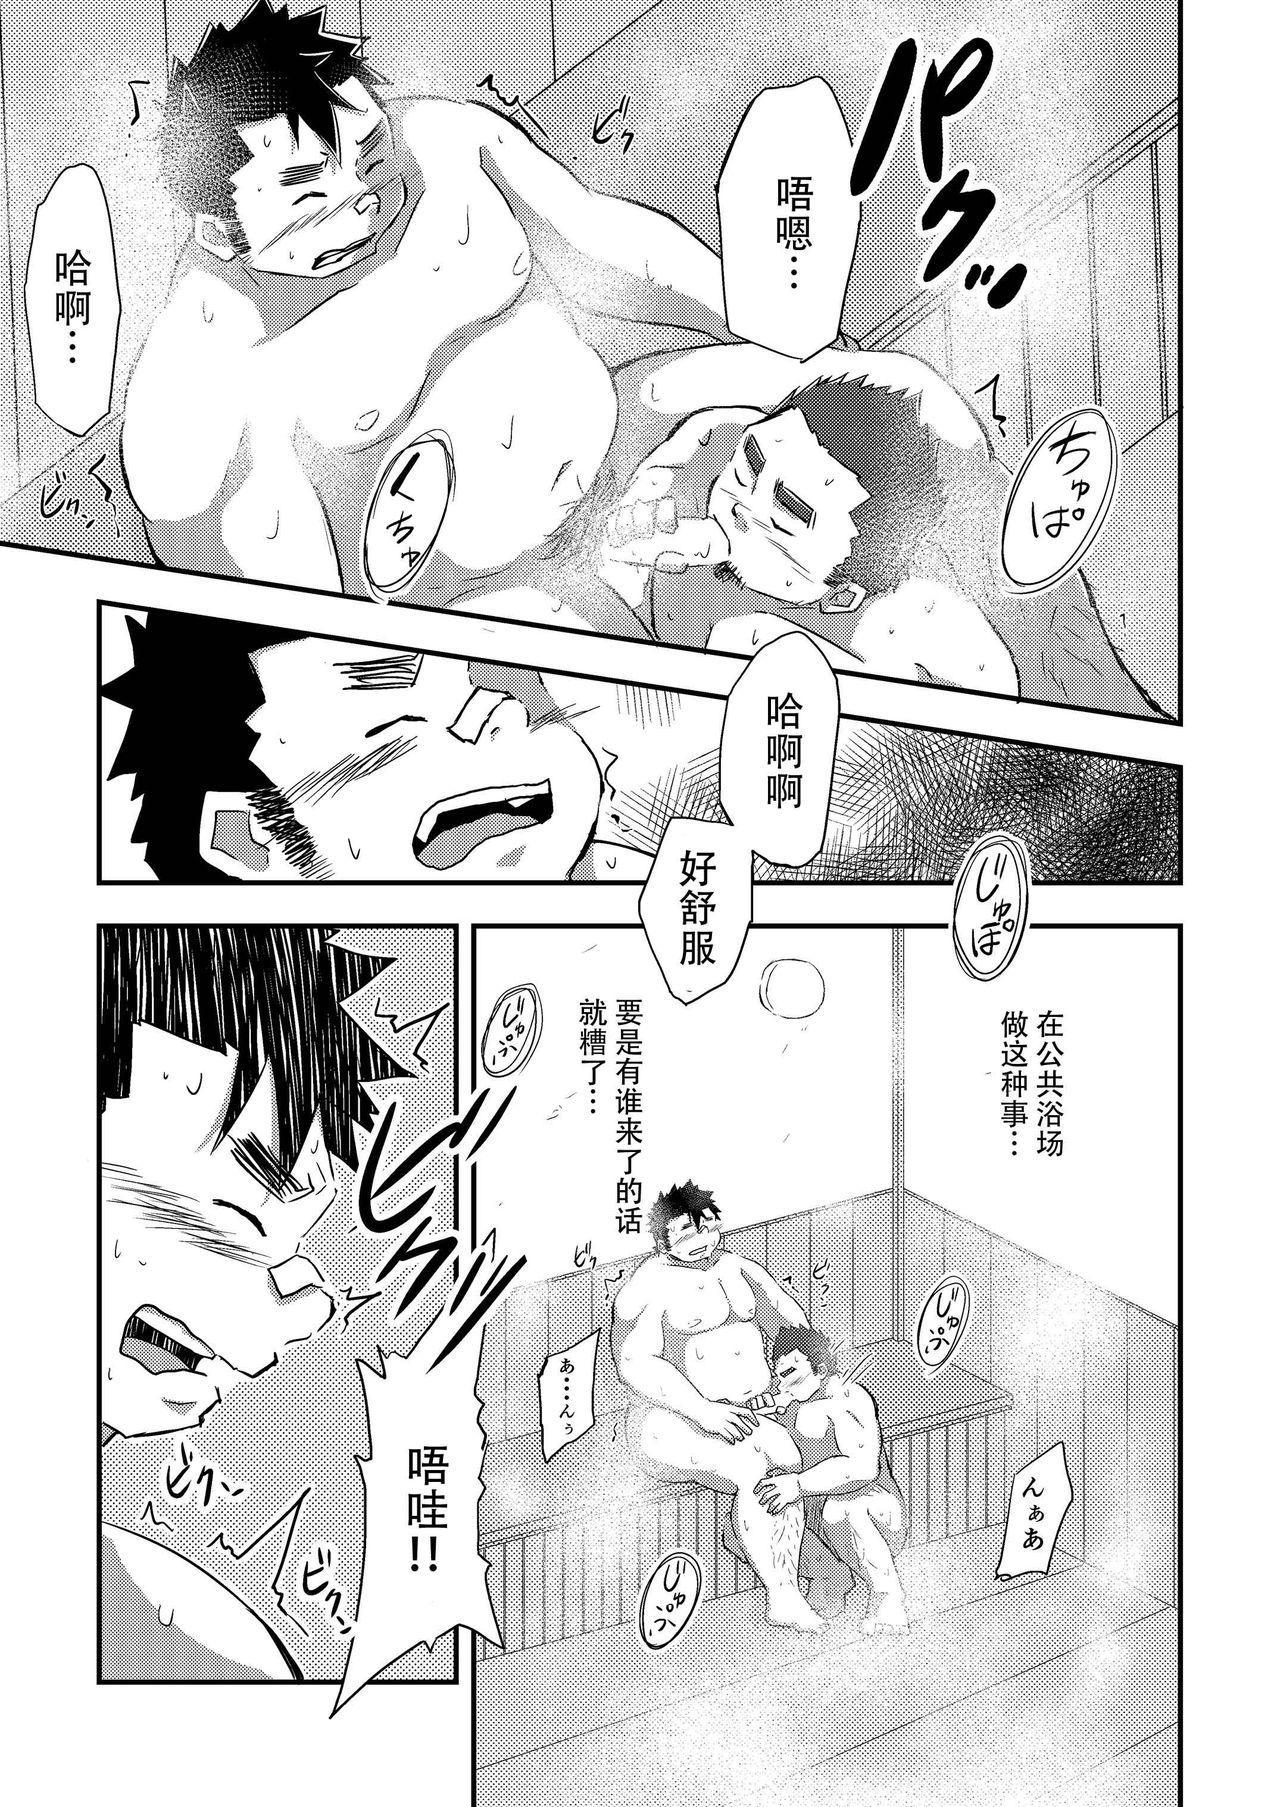 [CorkBOX (ngng)] Ise-kun wa Tamatte Iru. - Ise-kun is horny. [Chinese] {日曜日汉化} [Digital] 17